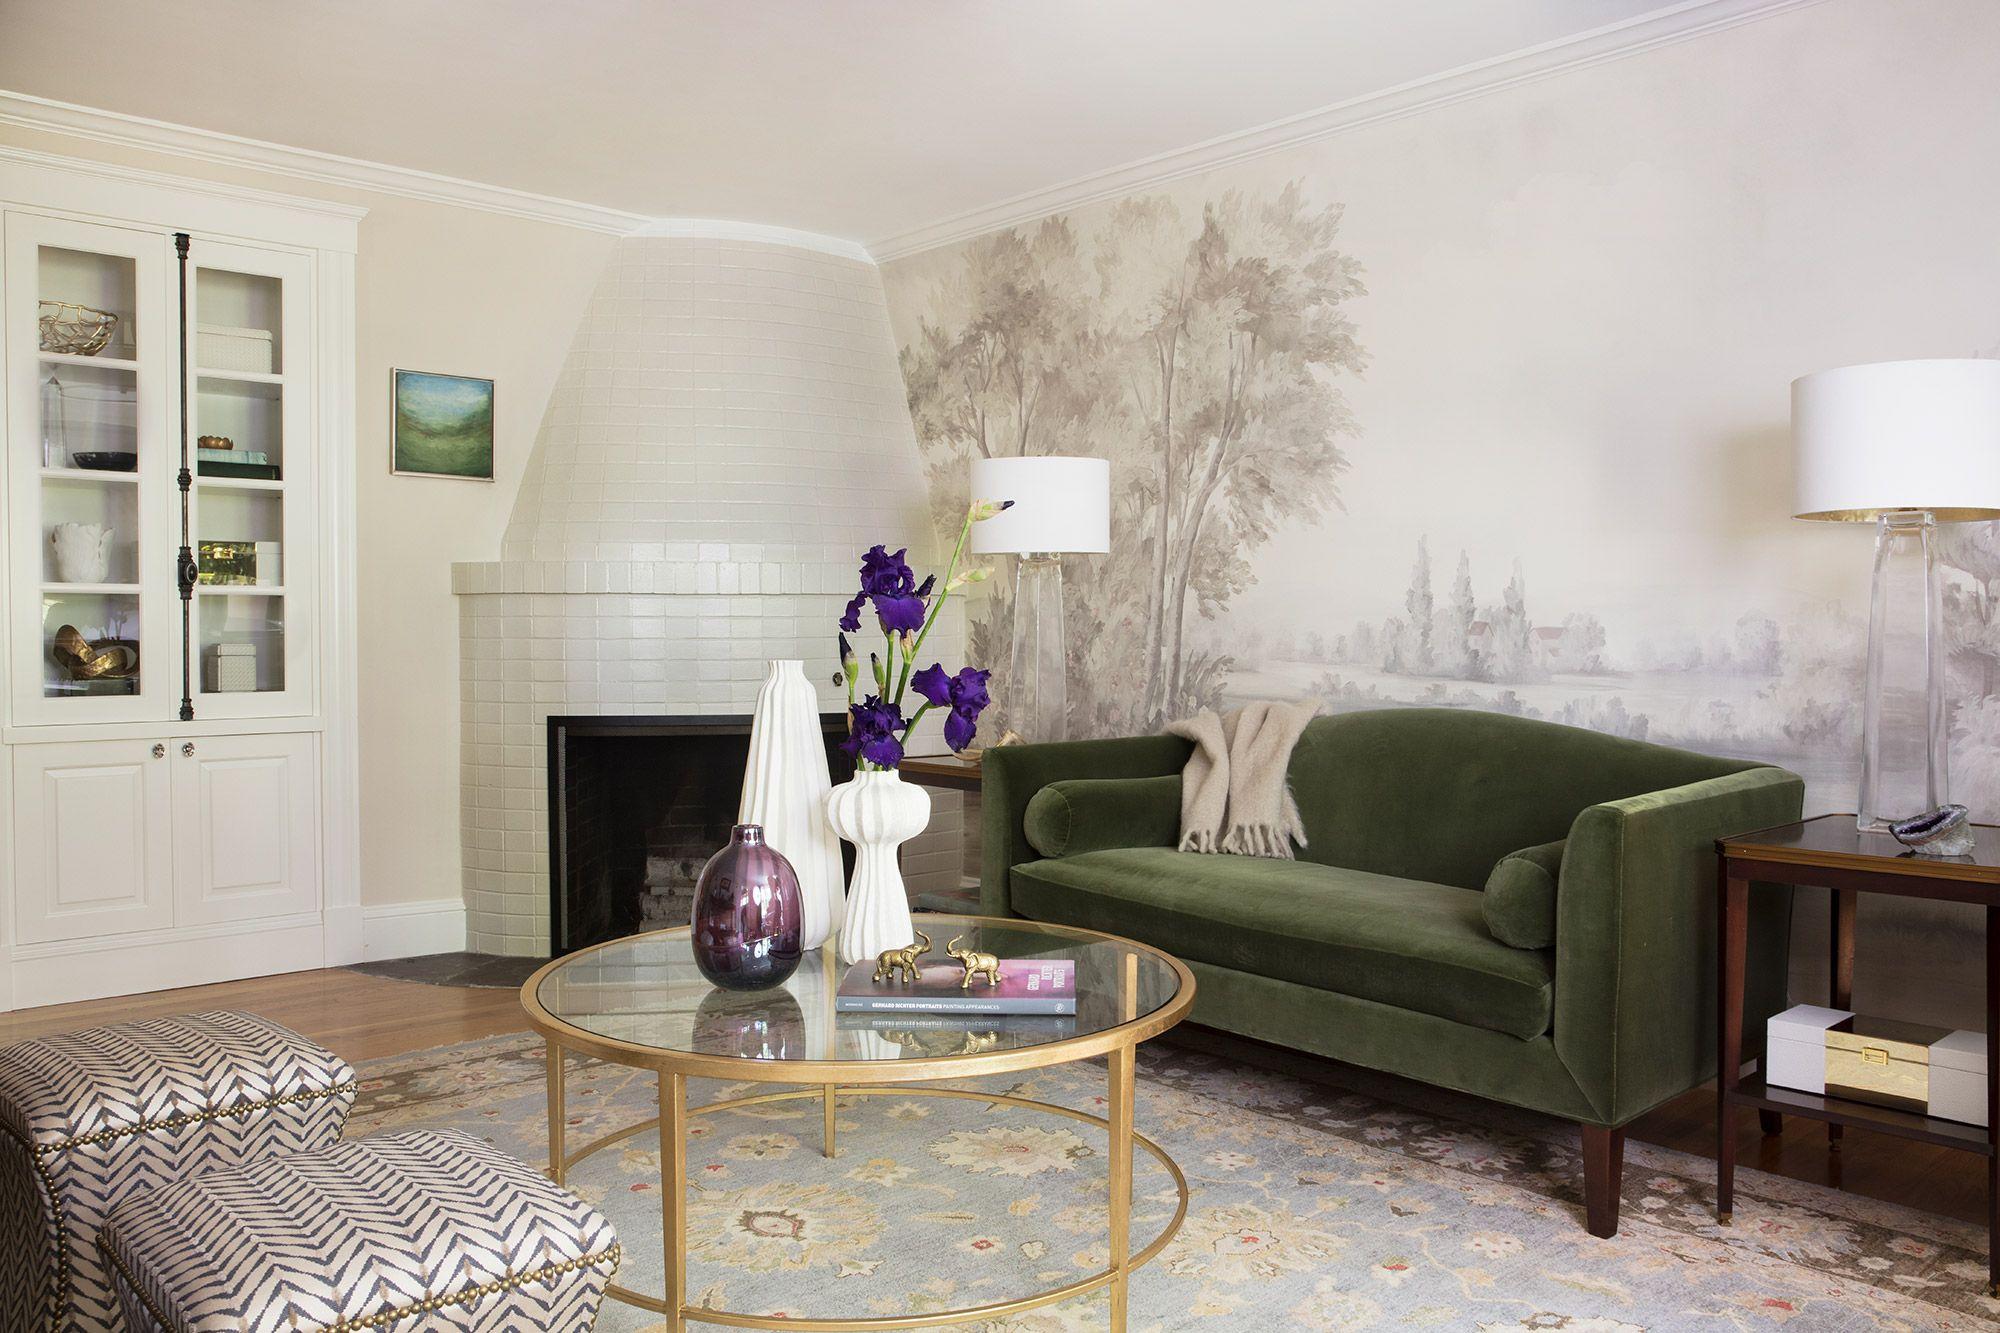 Calmsden Grisaille Sample 12 Susan Harter Muralpapers Living Room Designs Classy Living Room Living Room Murals #sample #living #room #design